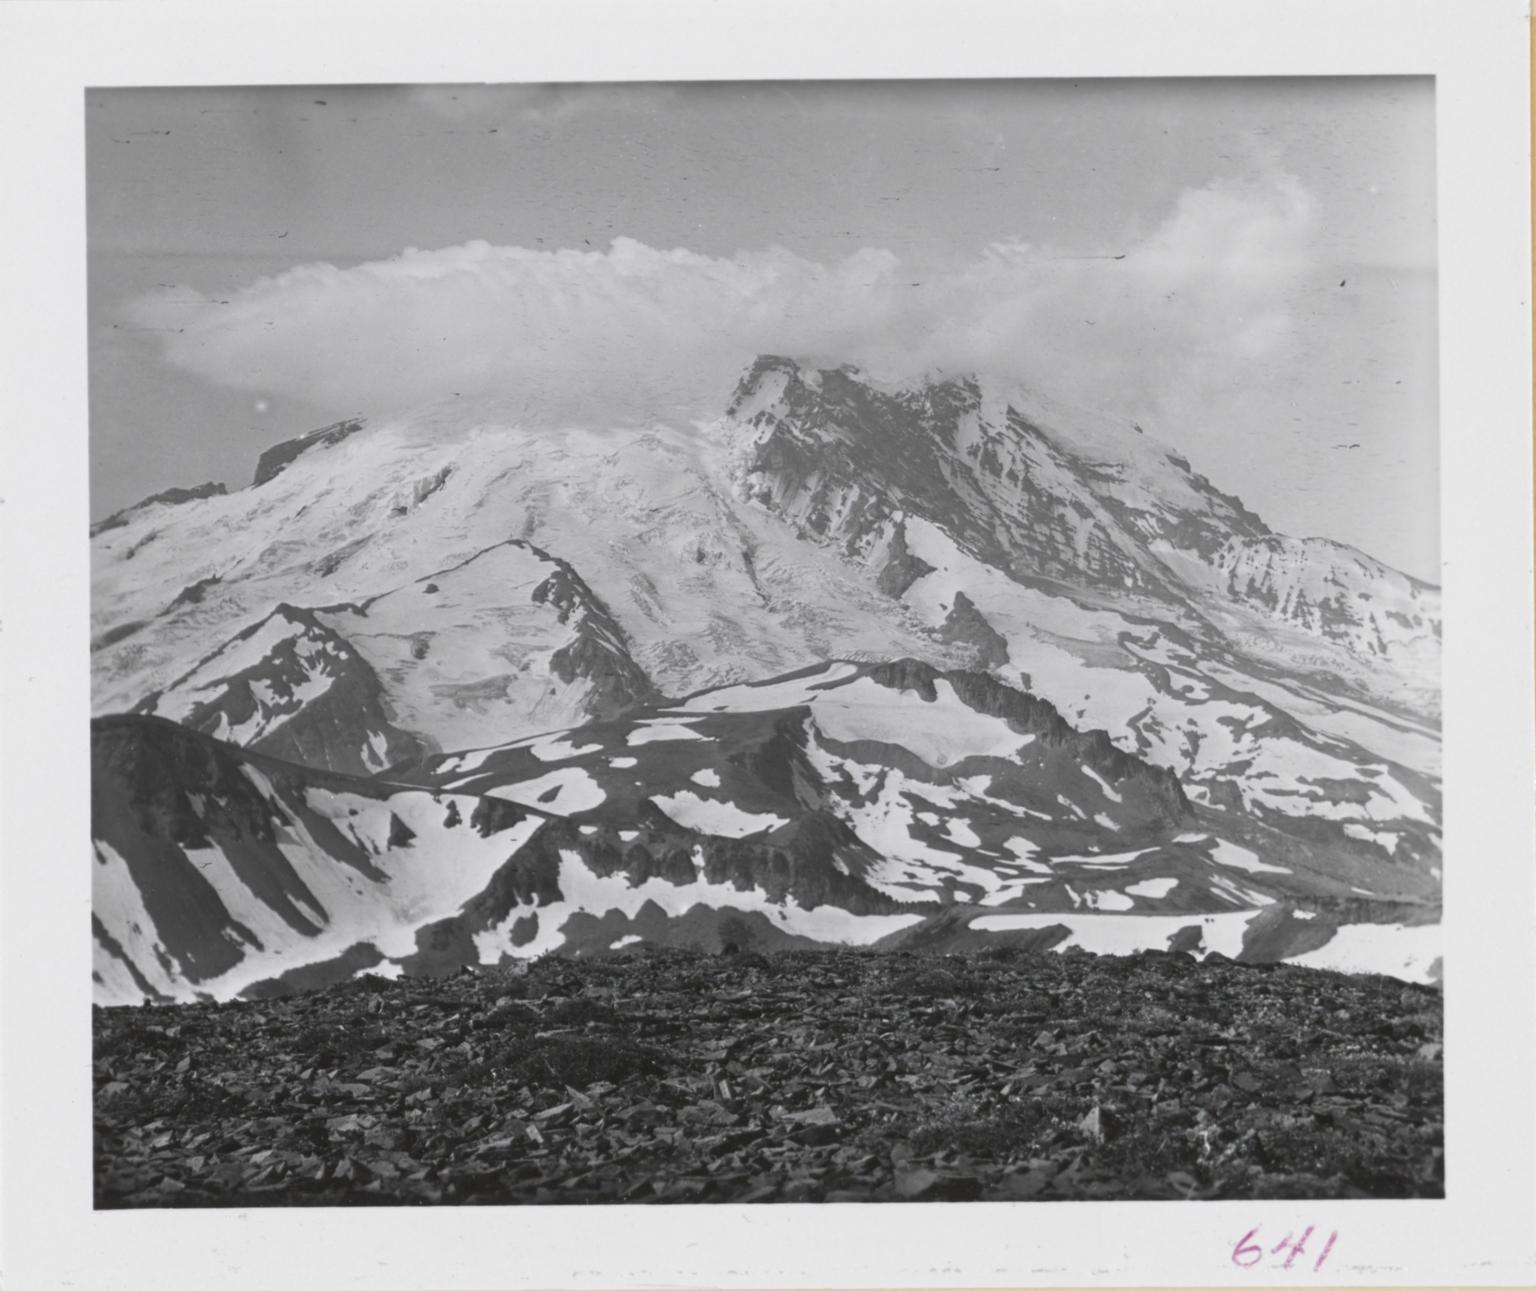 White Glacier, Washington